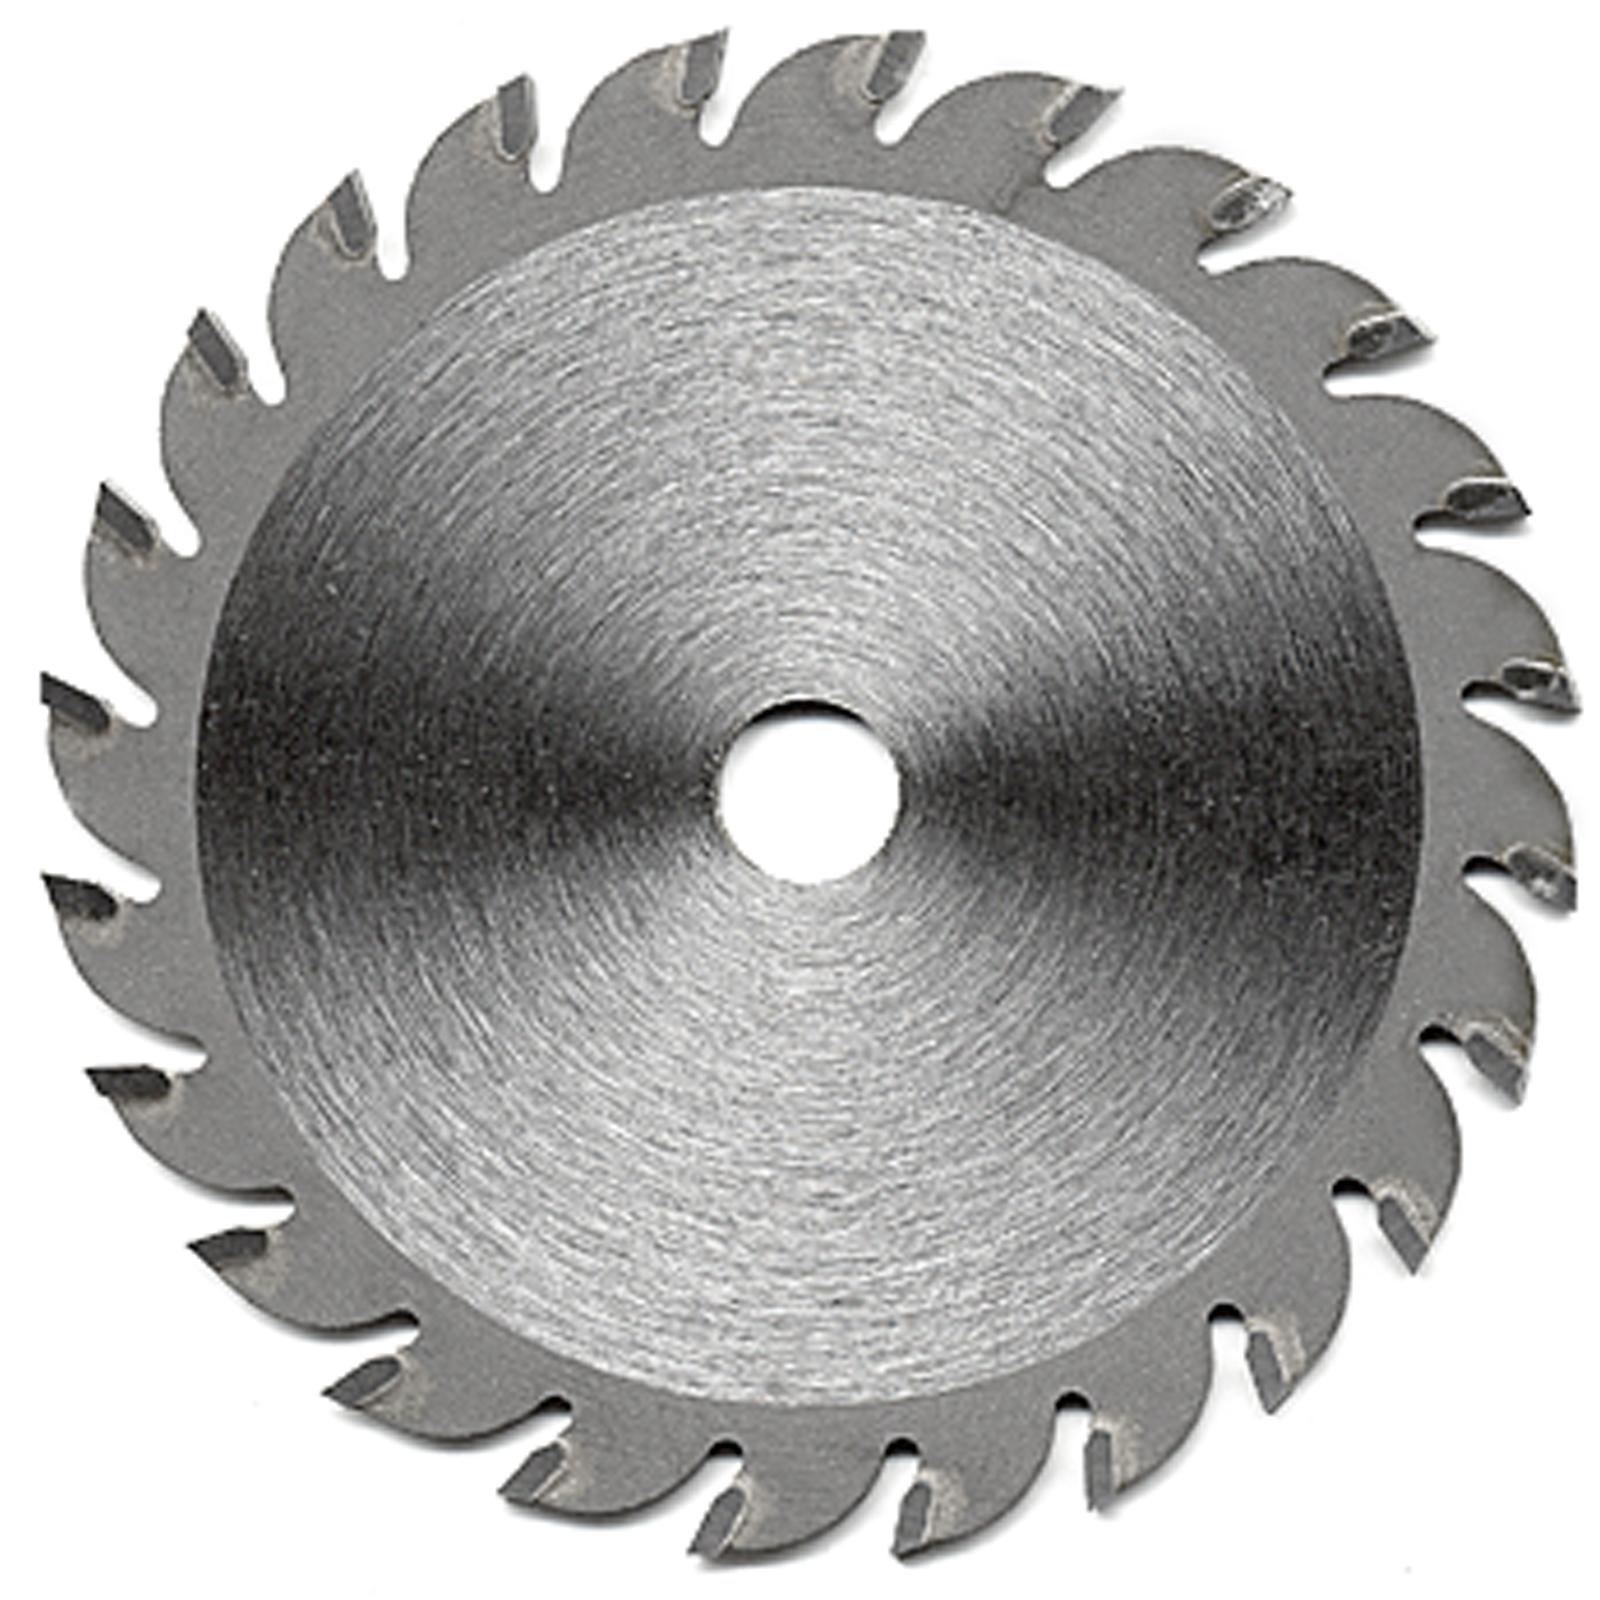 24 Tooth Carbide Tip Saw Blade 3 1 4 Inch Dia 10 Mm Hole